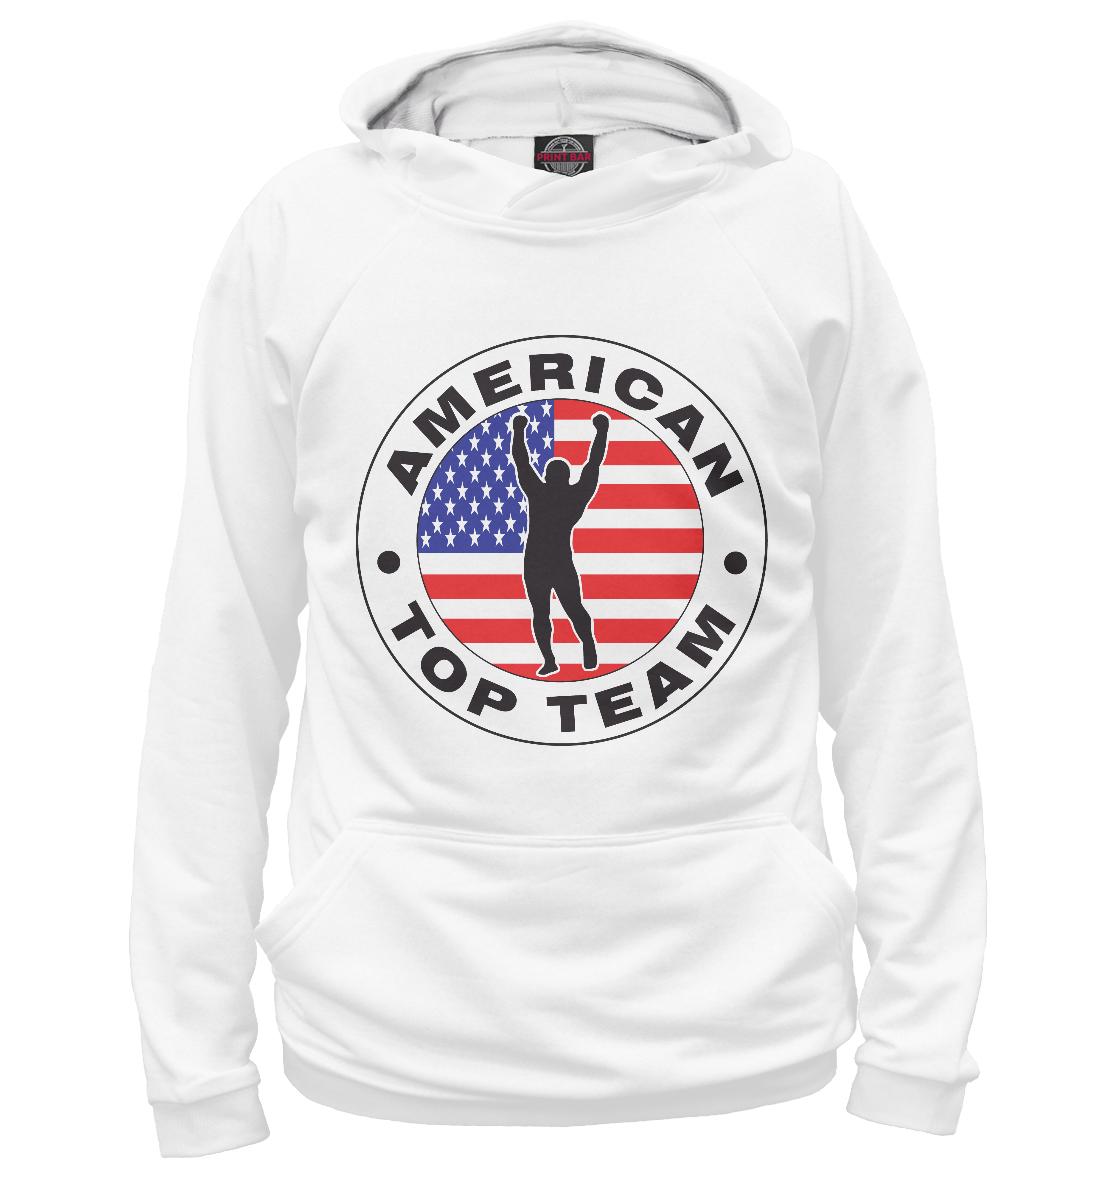 Купить American Top Team, Printbar, Худи, MNU-730226-hud-1